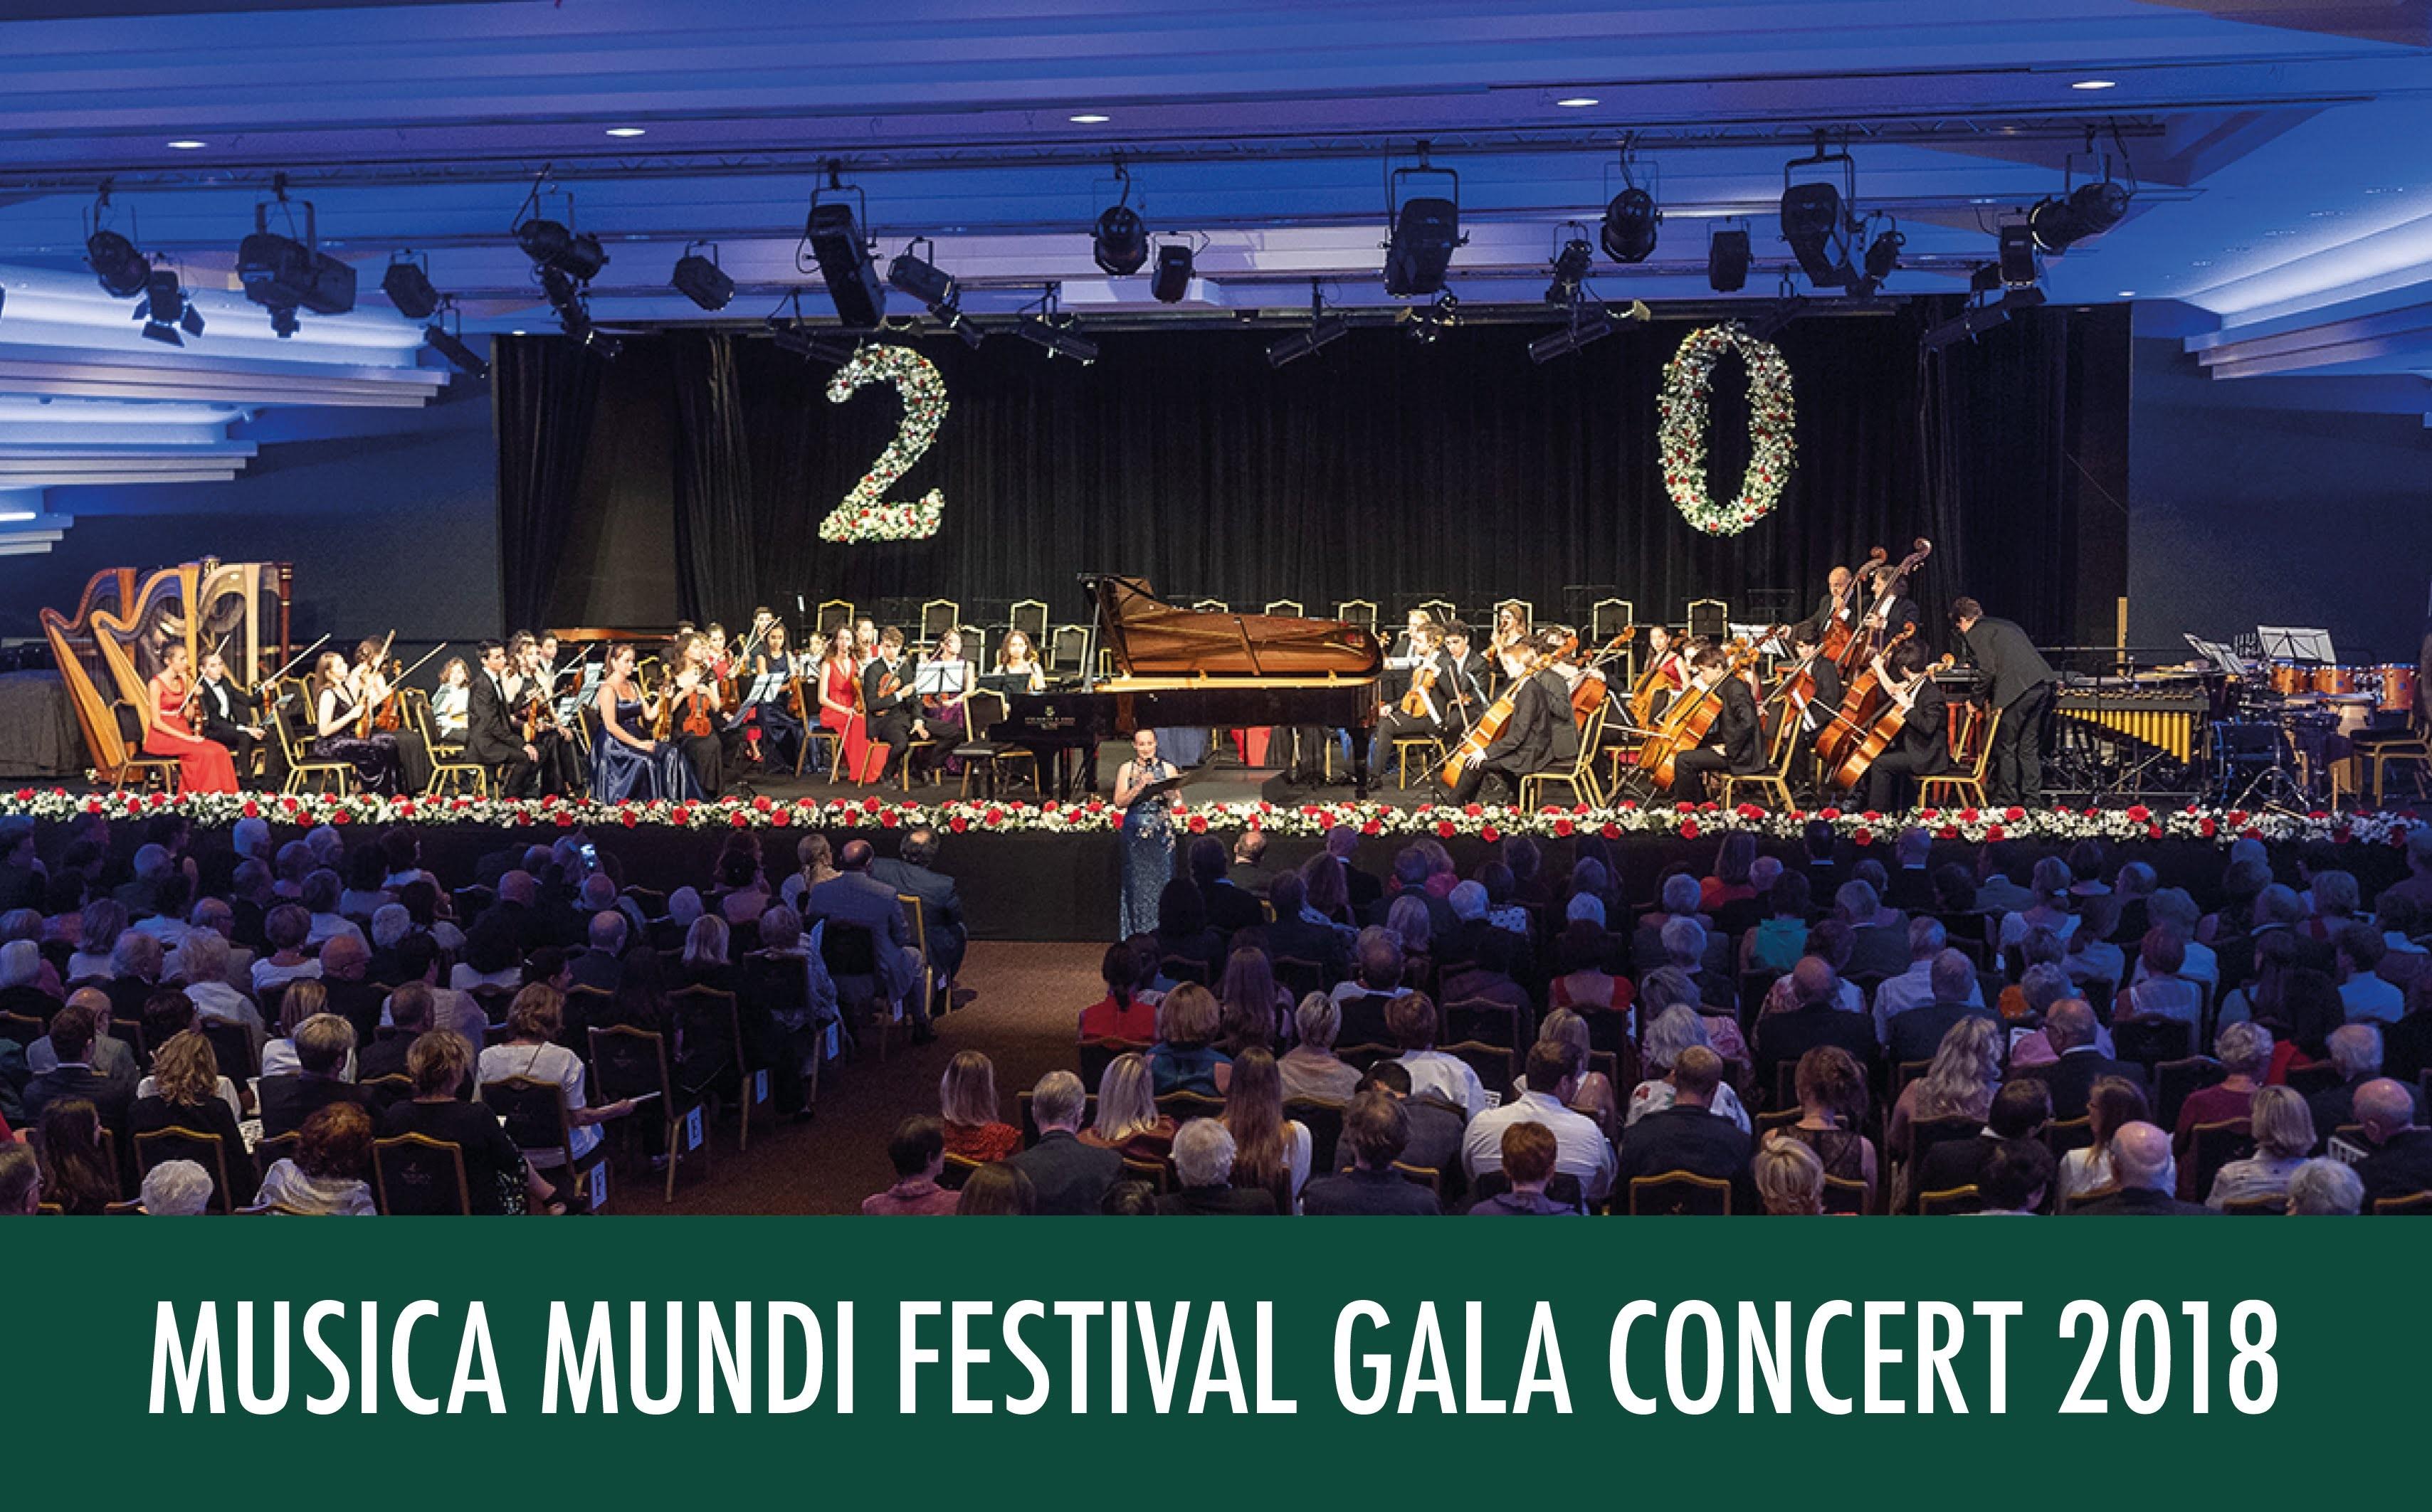 MUSICA MUNDI 2018 FESTIVAL GALA CONCER